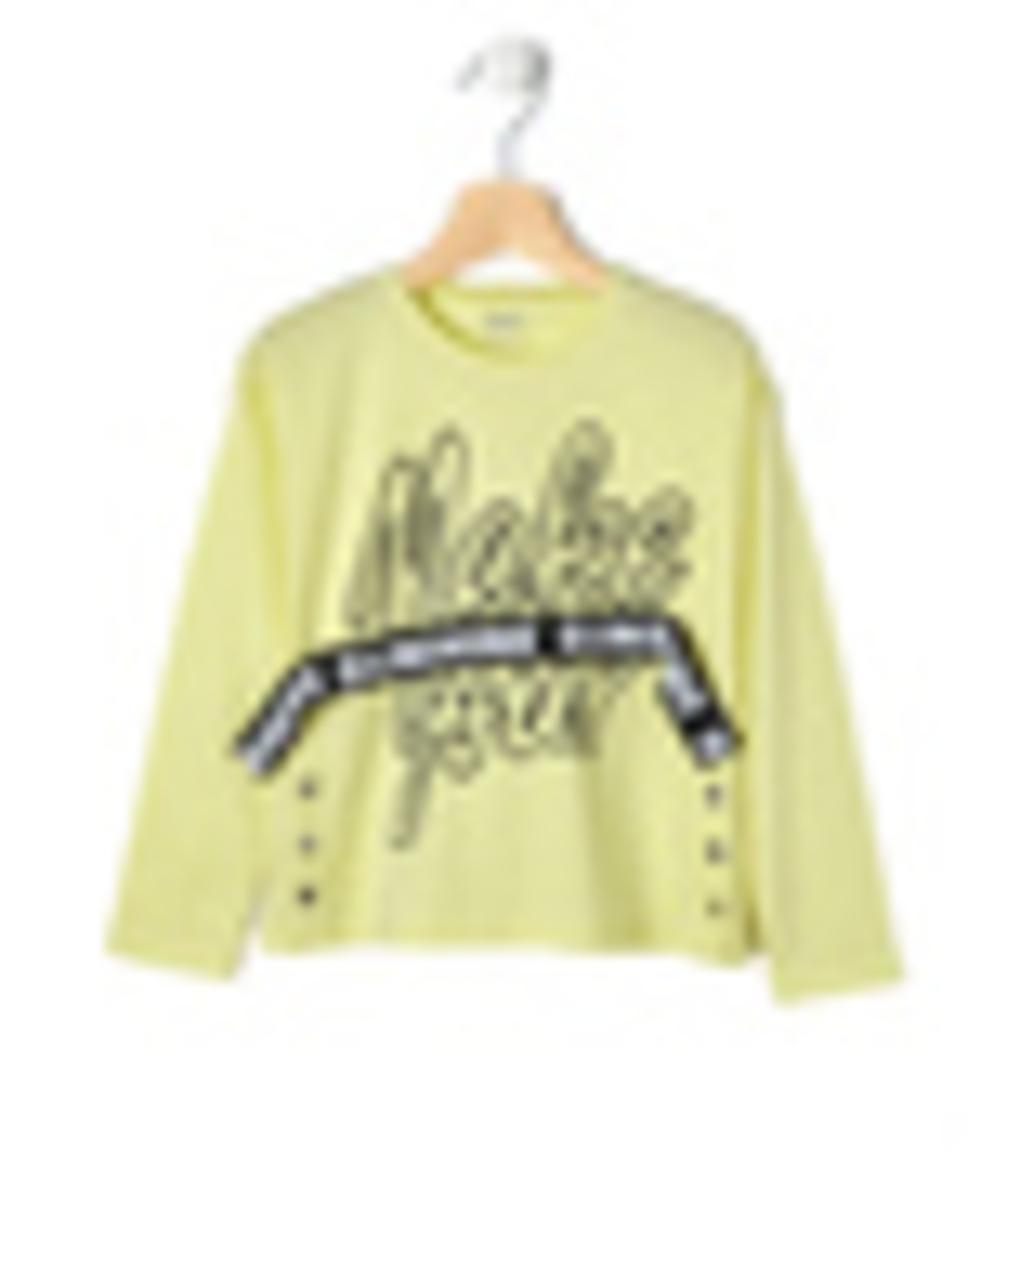 T-shirt Jersey με Κορδέλα Μεγ.8-9/9-10 ετών για Κορίτσι